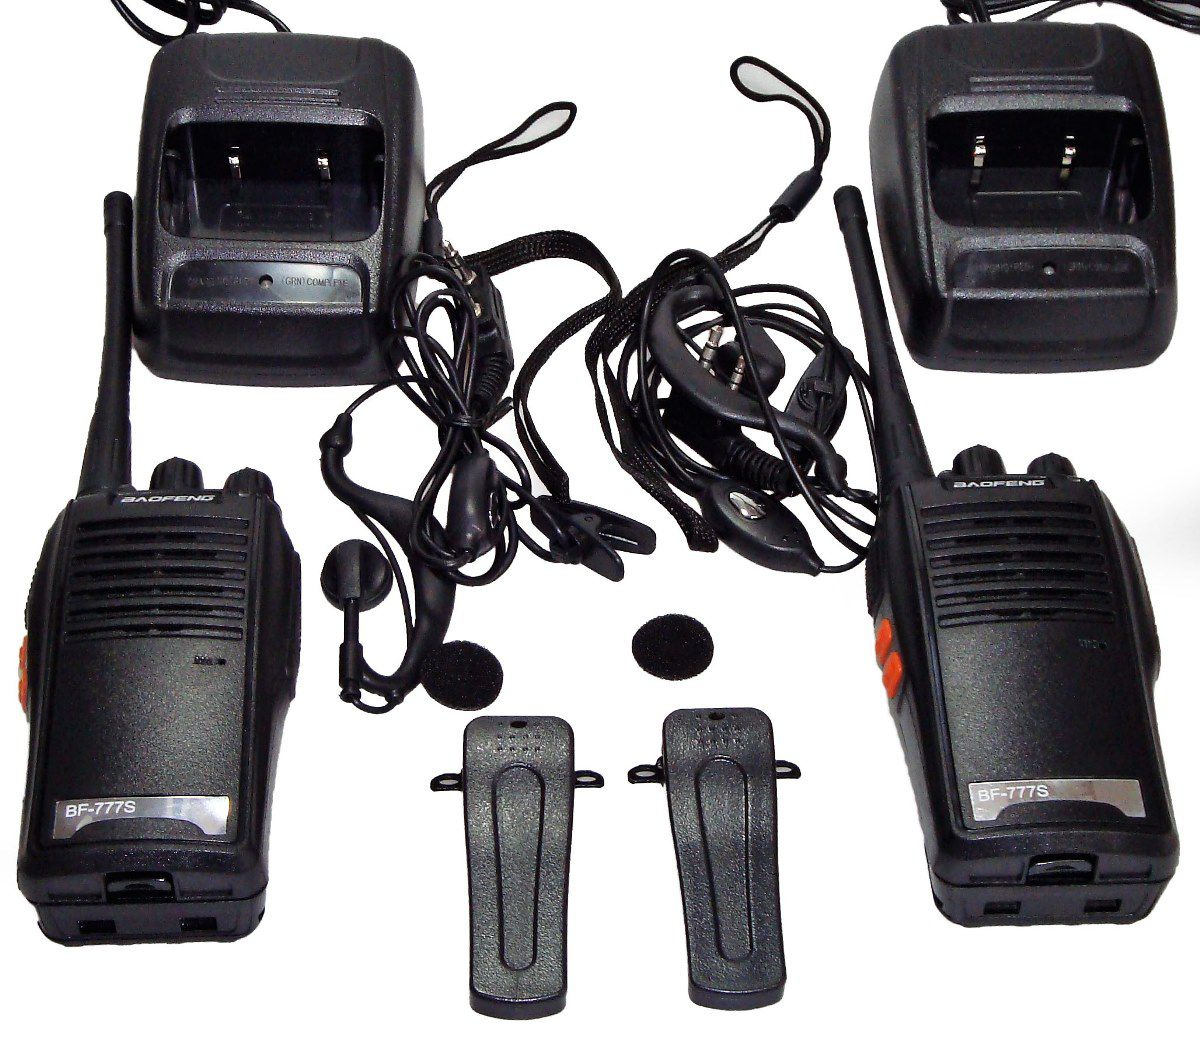 Kit 4 Radio Comunicador Profissional 16 Canais + Fone Ouvido